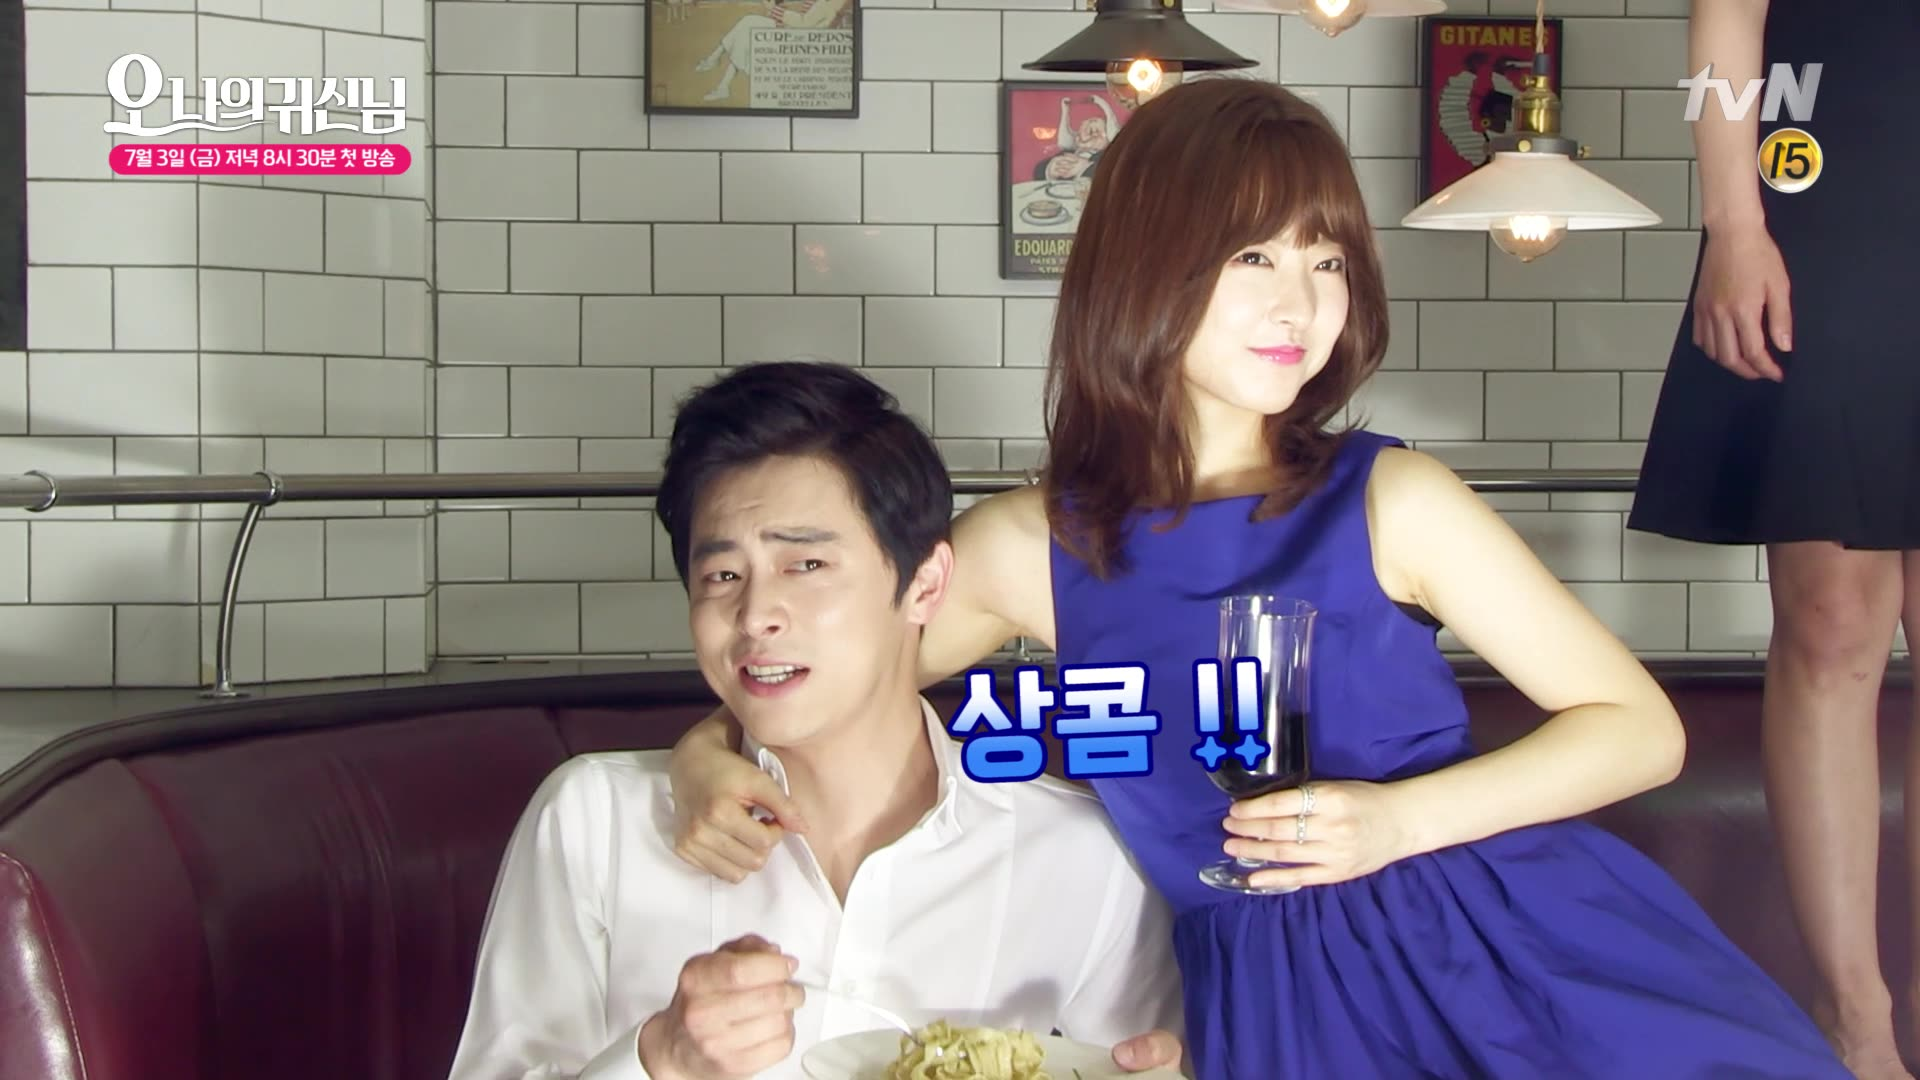 Oh My Ghostess - 오 나의 귀신님 - Watch Full Episodes Free - Korea